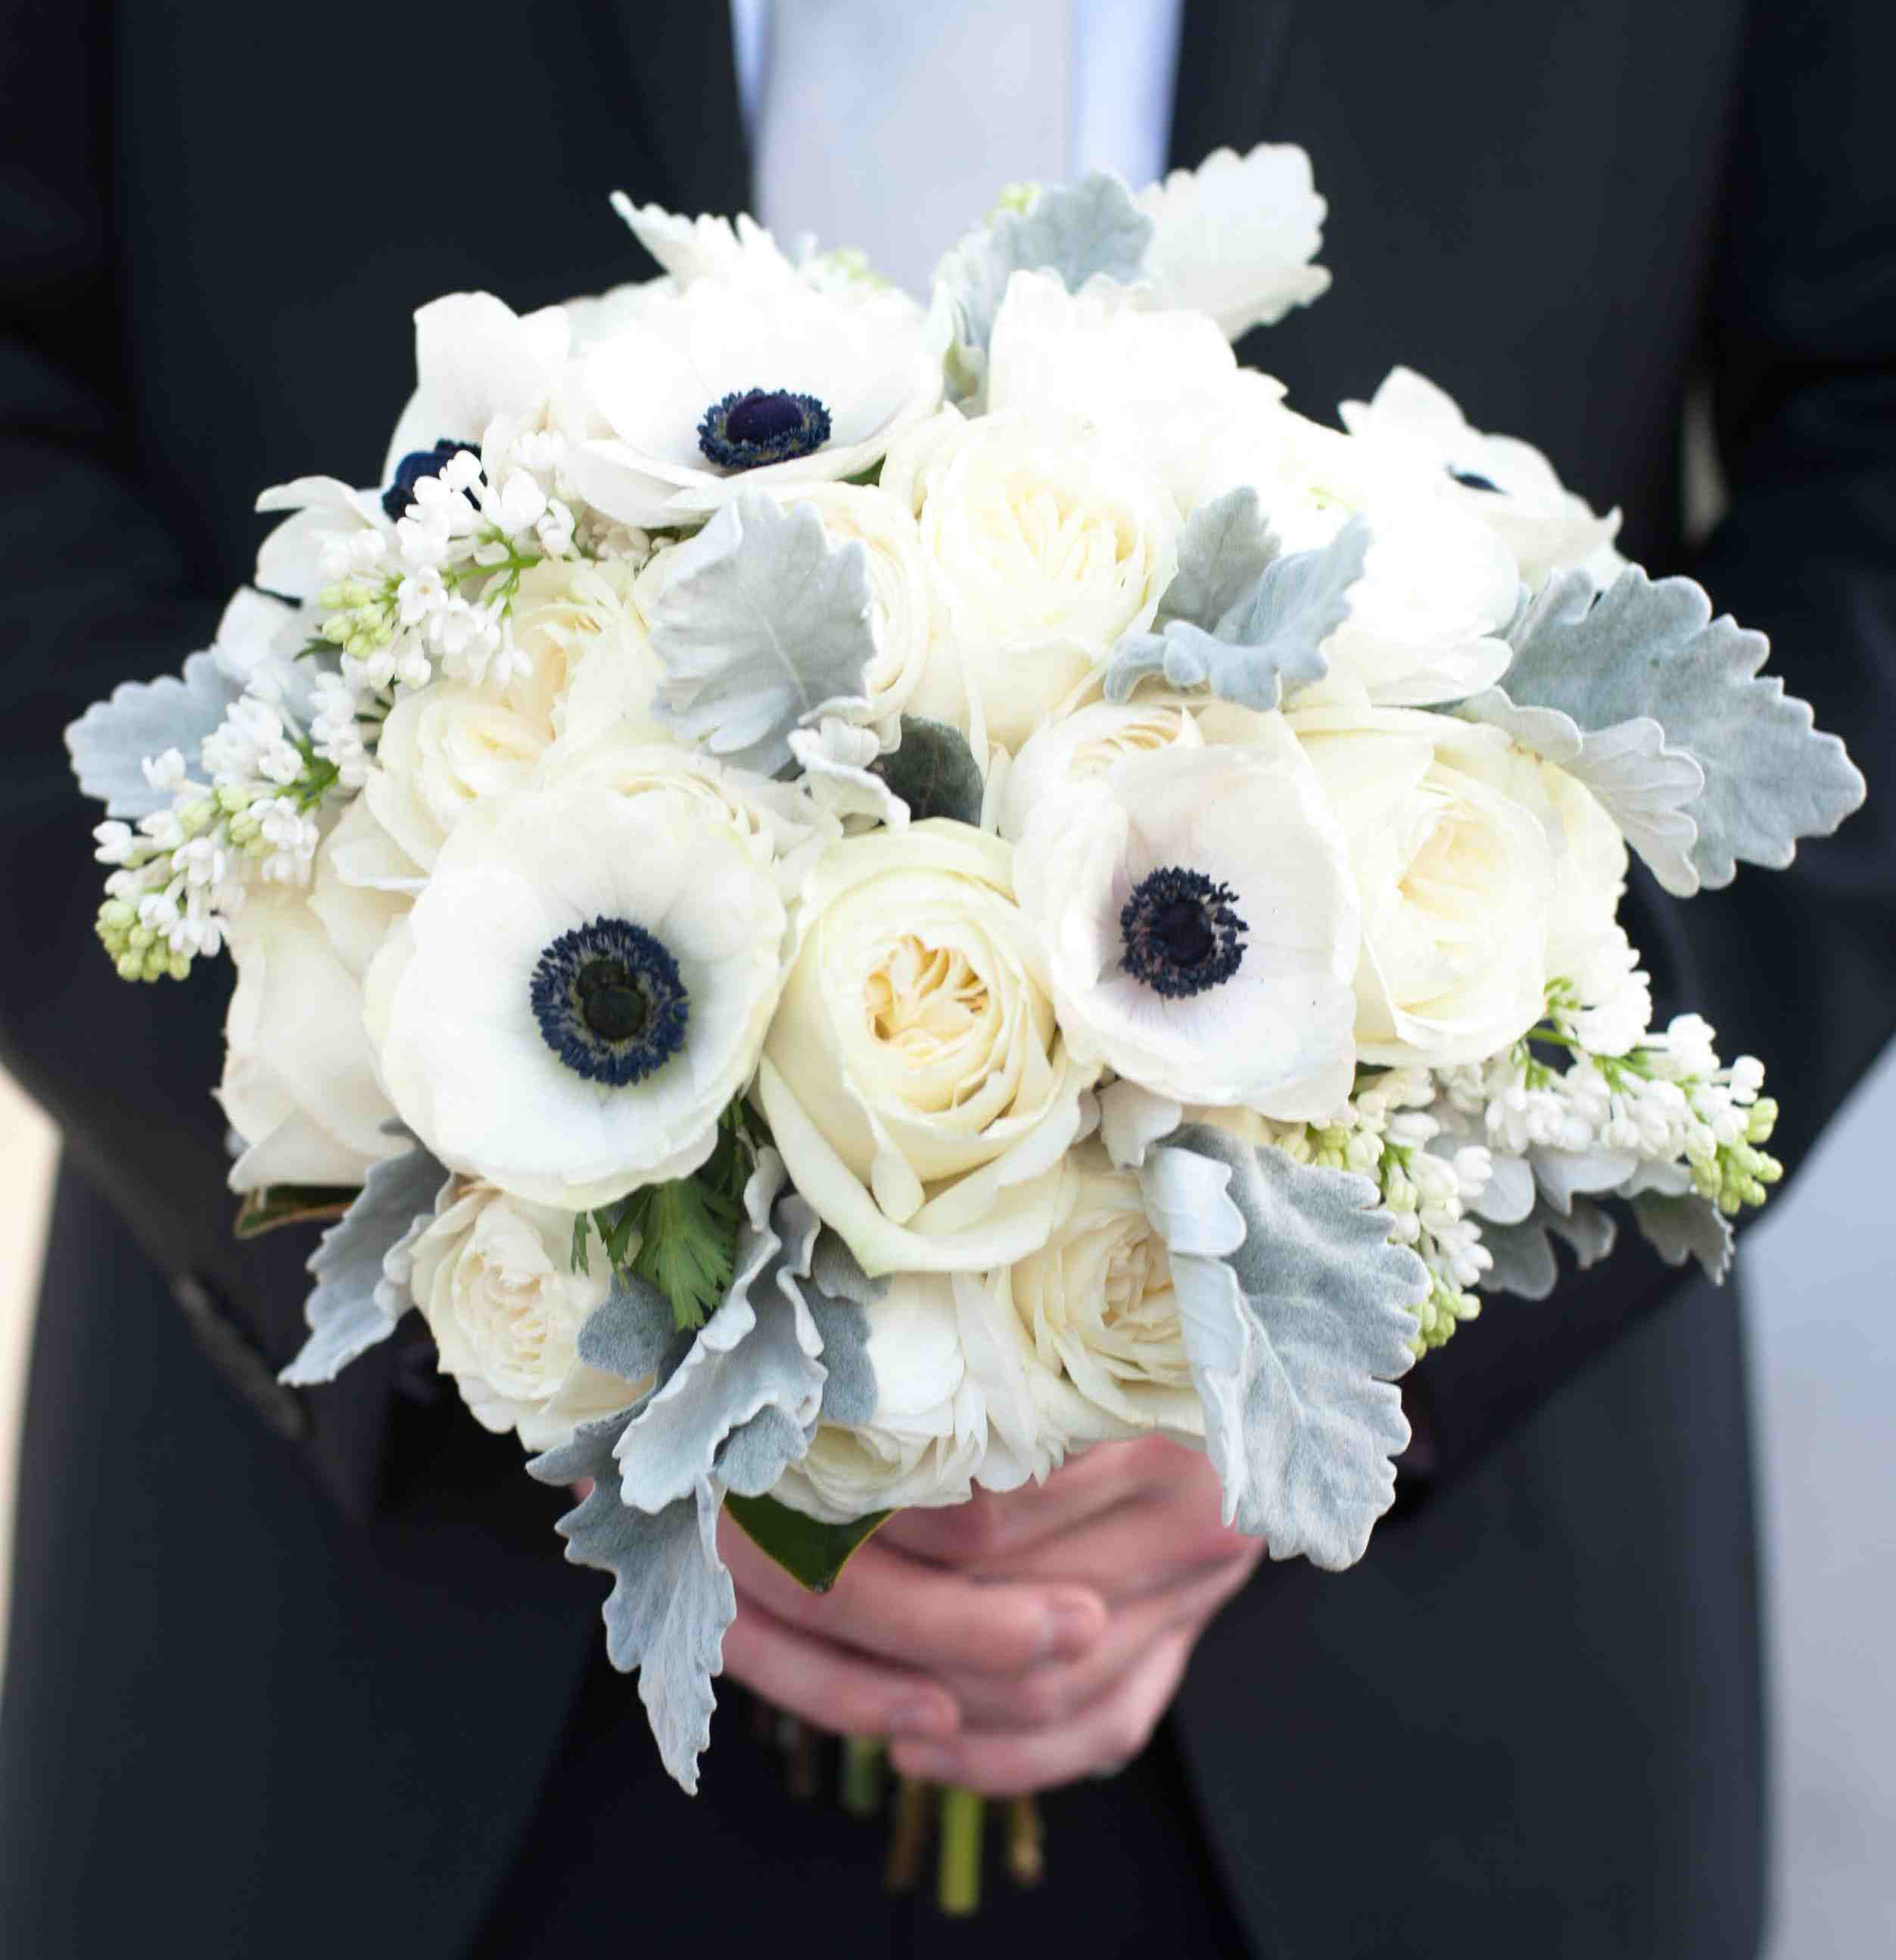 anemone bouquets wedding photo - 1